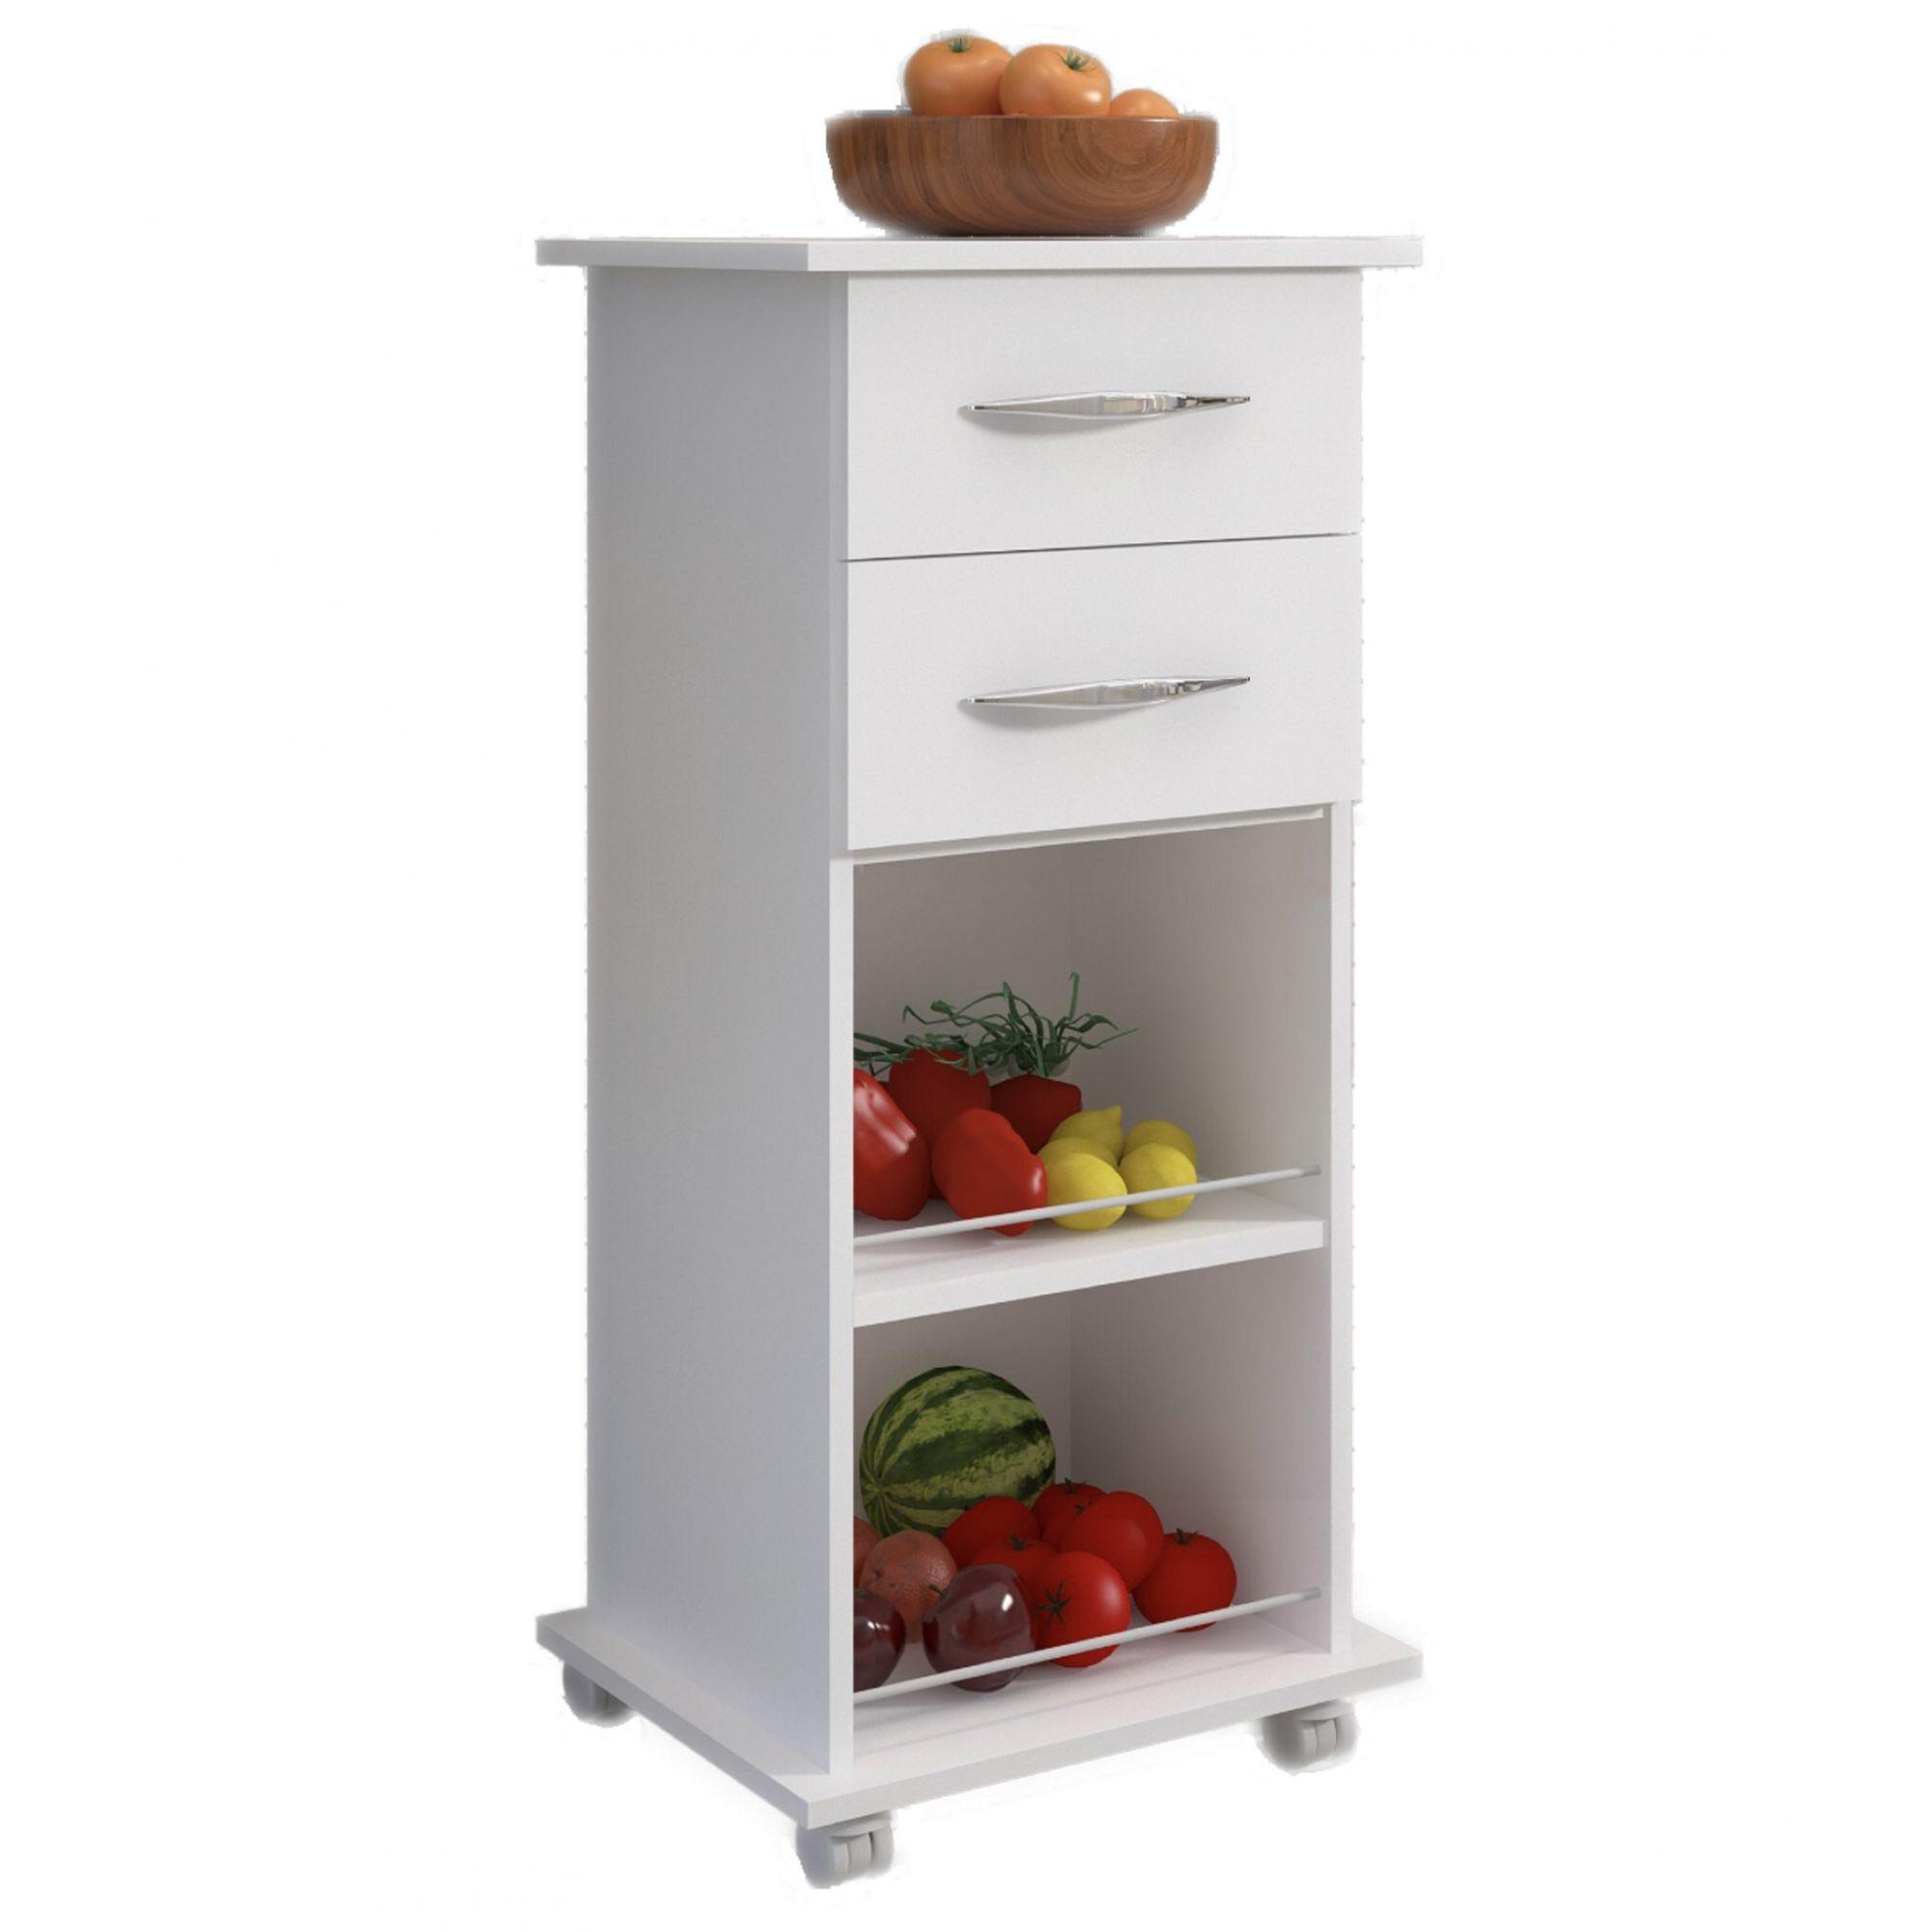 Fruteira 2 Cestos Cozinha Multiuso Base Microondas Branco